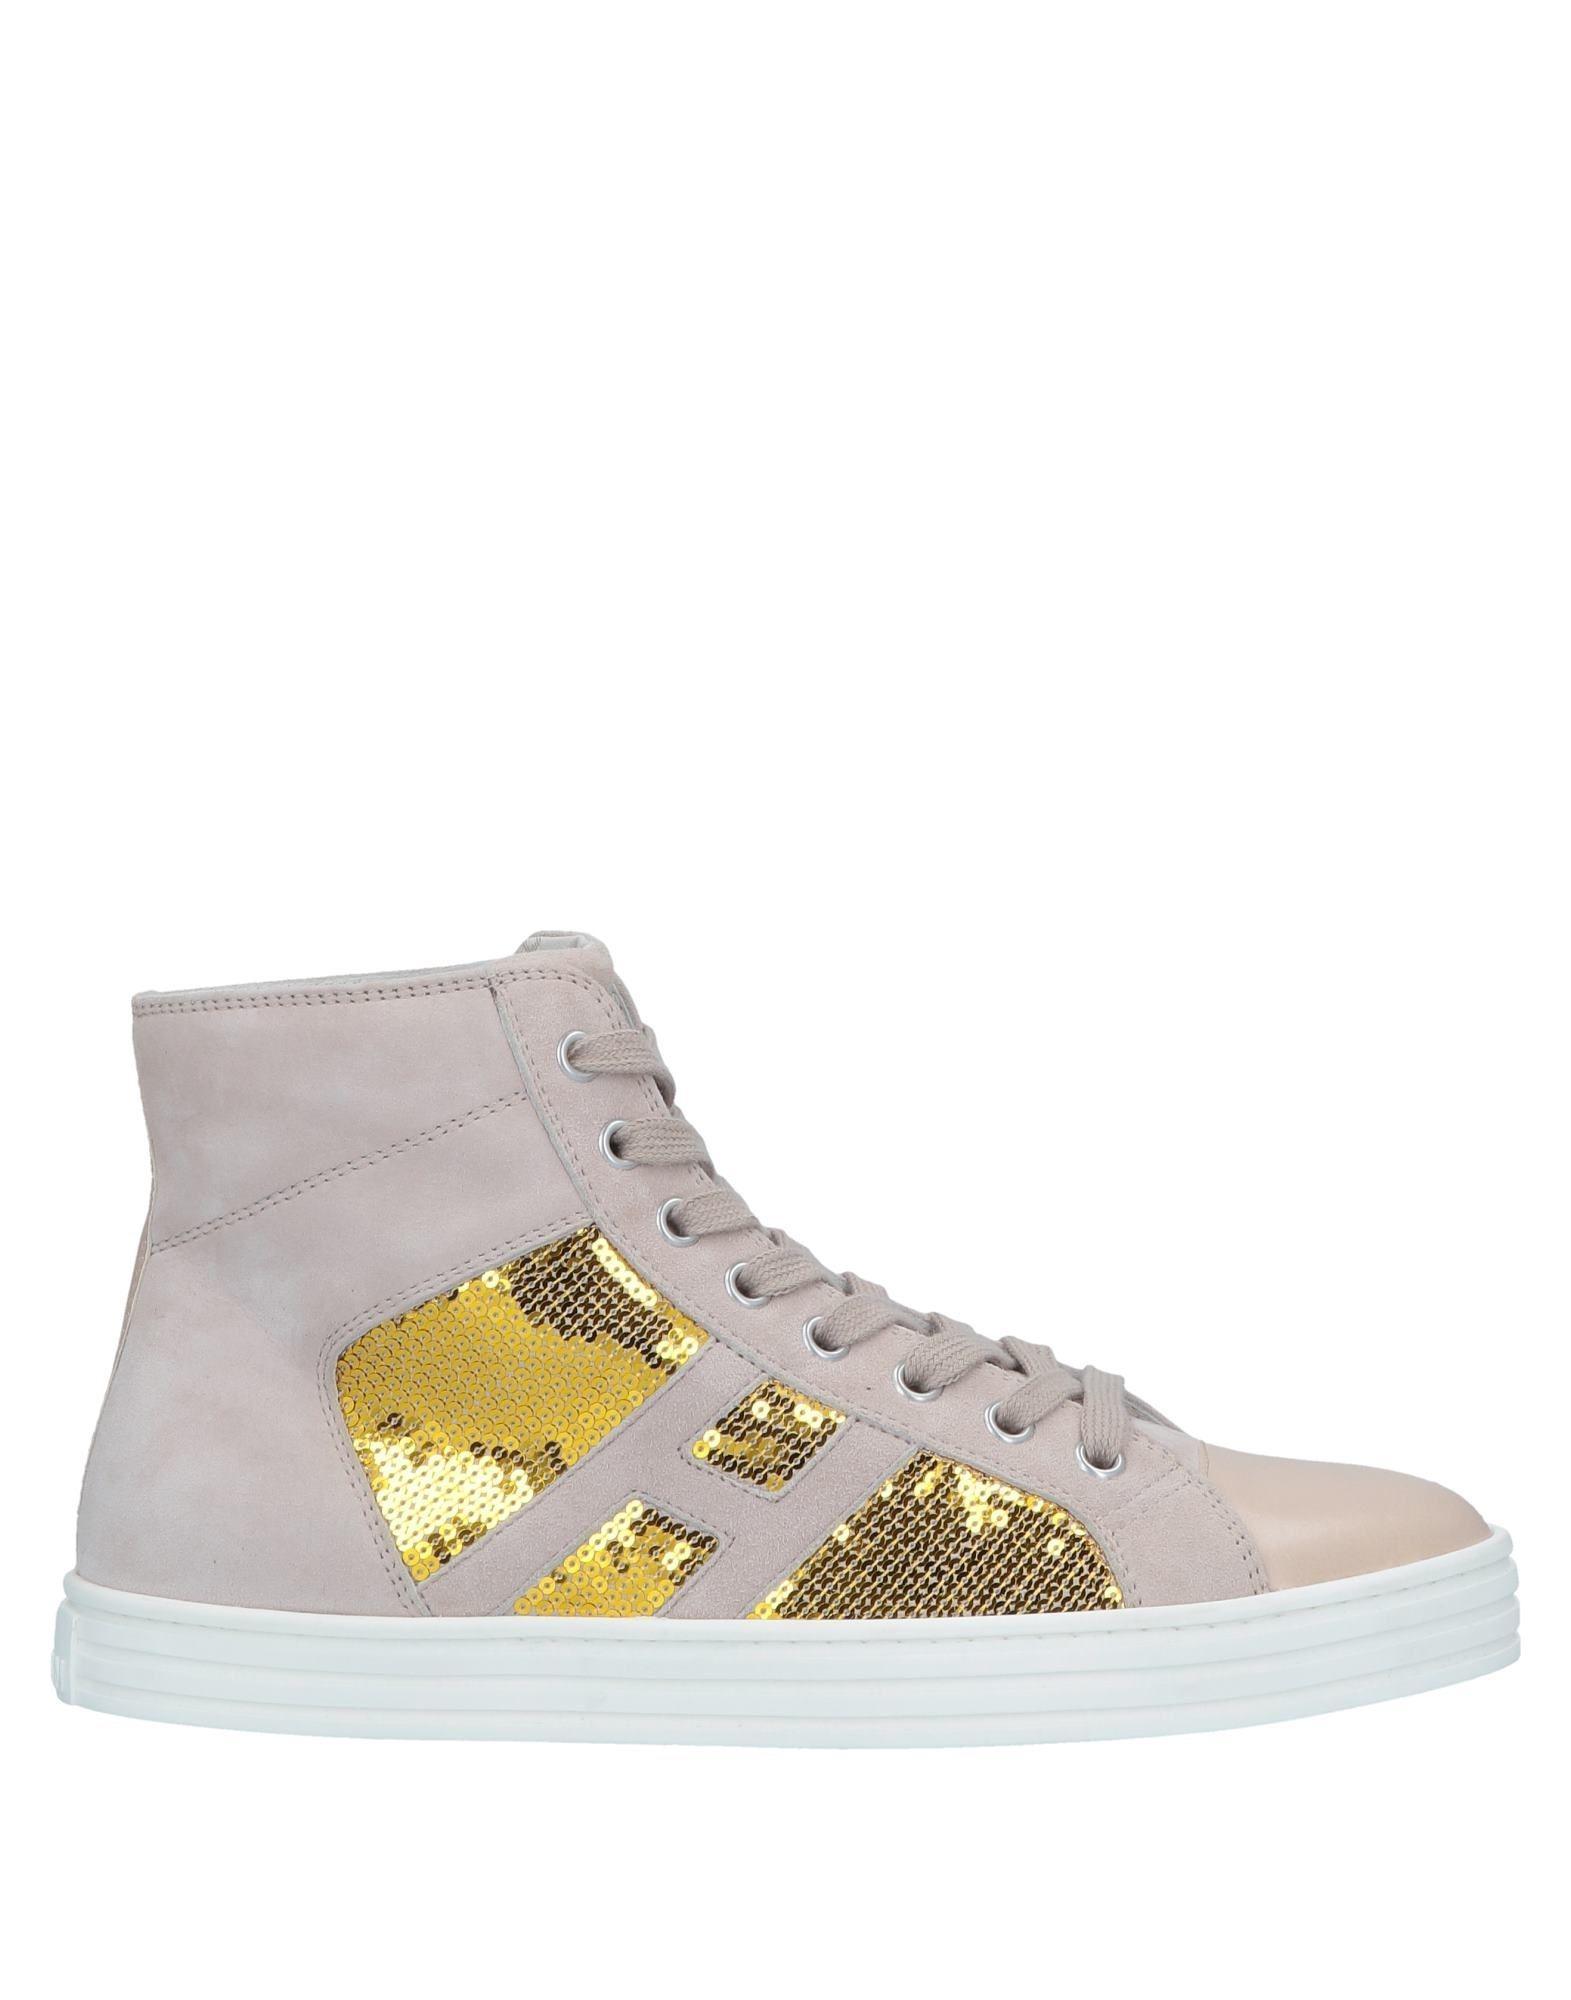 95cecd31475 Lyst - Hogan Rebel High-tops   Sneakers in Natural